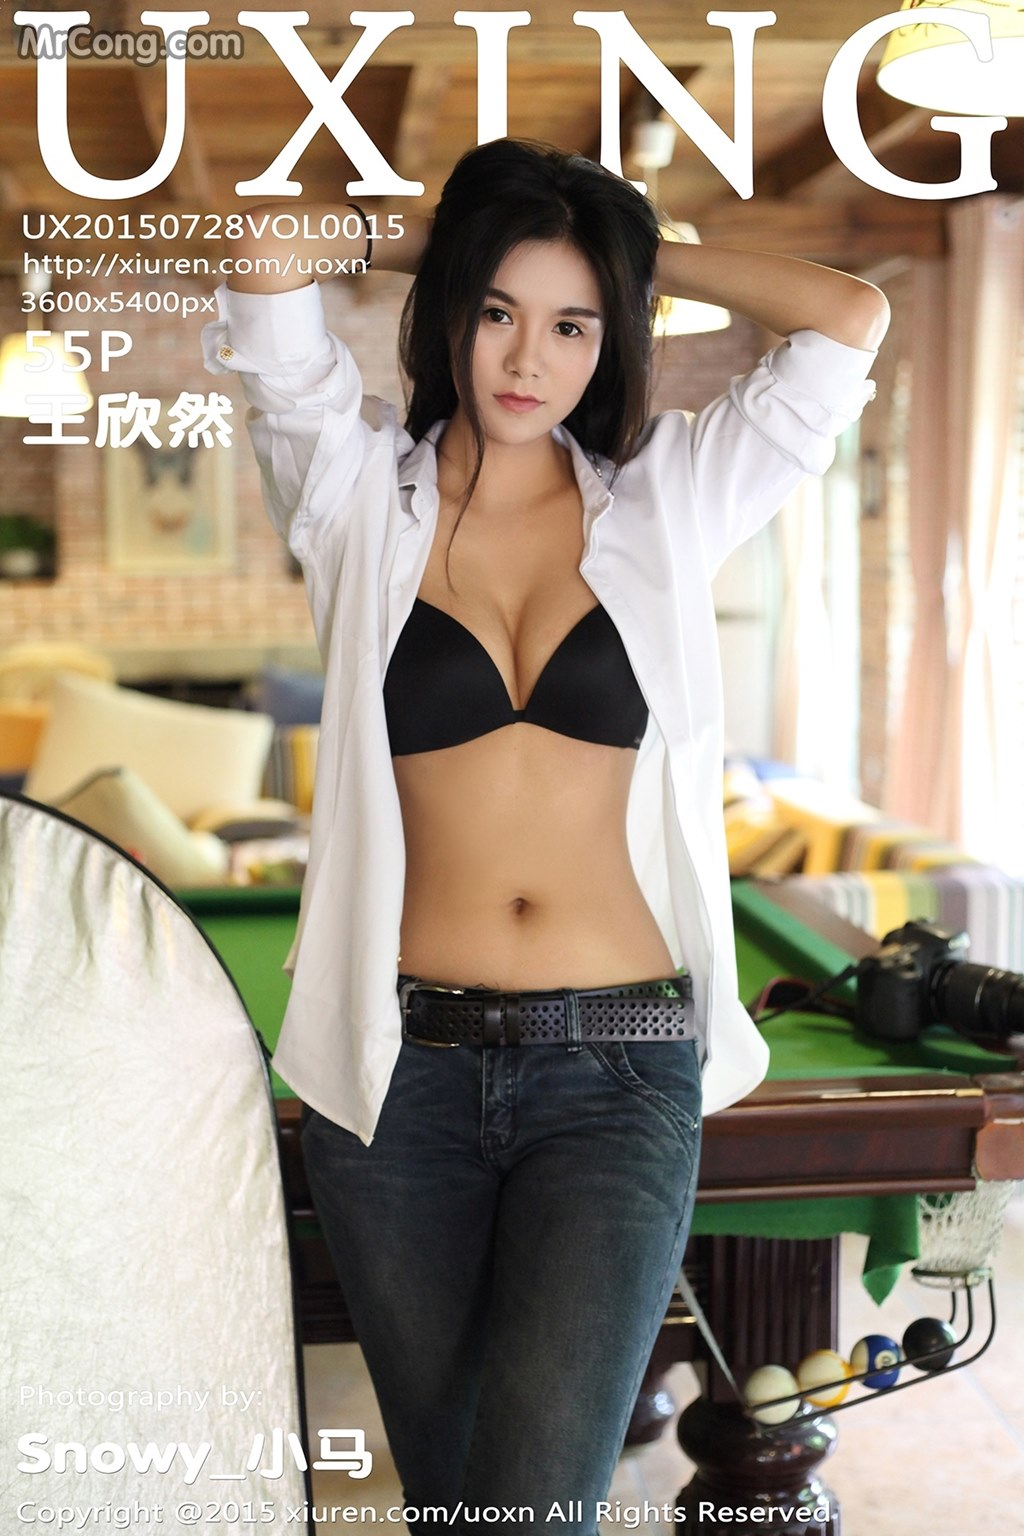 UXING Vol.015: Model Wang Xin Ran (王欣然) (56 photos)